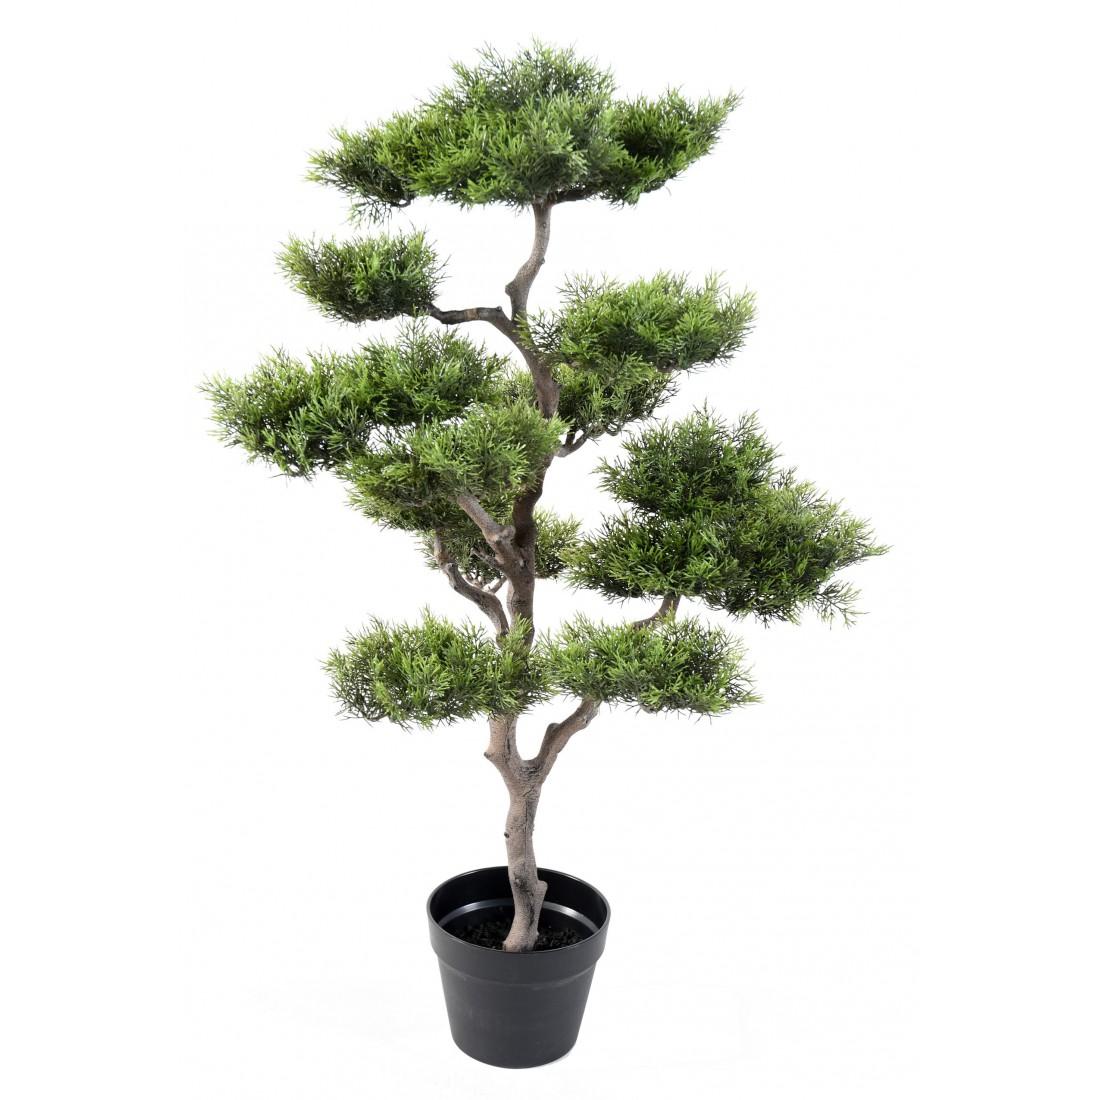 bonsai arbre fruitier cheap arbre artificiel fruitier. Black Bedroom Furniture Sets. Home Design Ideas